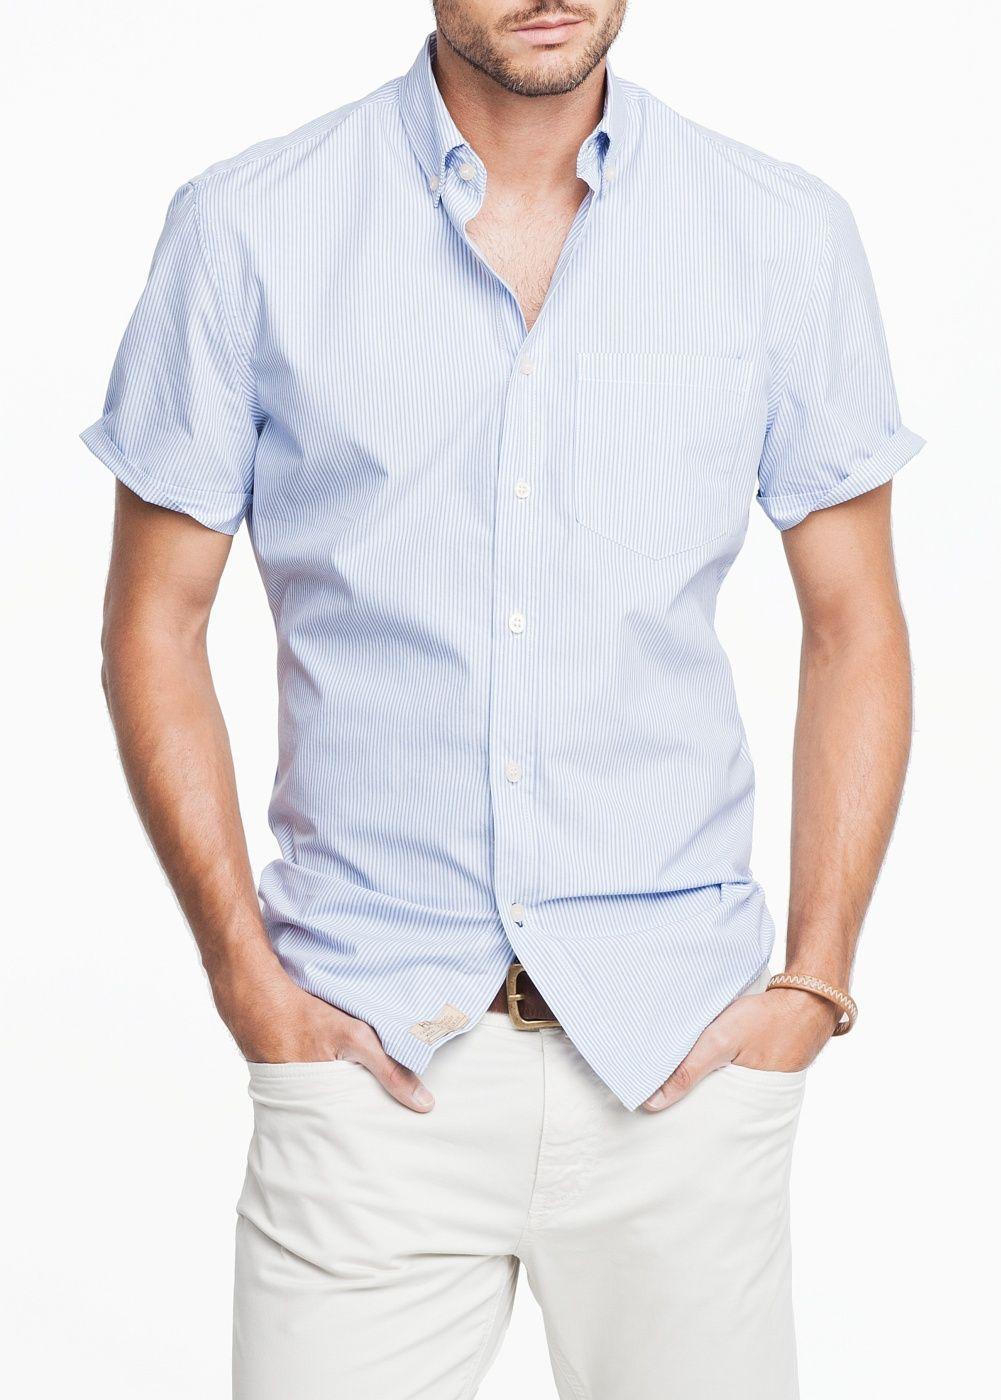 Nuevo 2015 Summer Formal azul Blusa mujer camisas manga